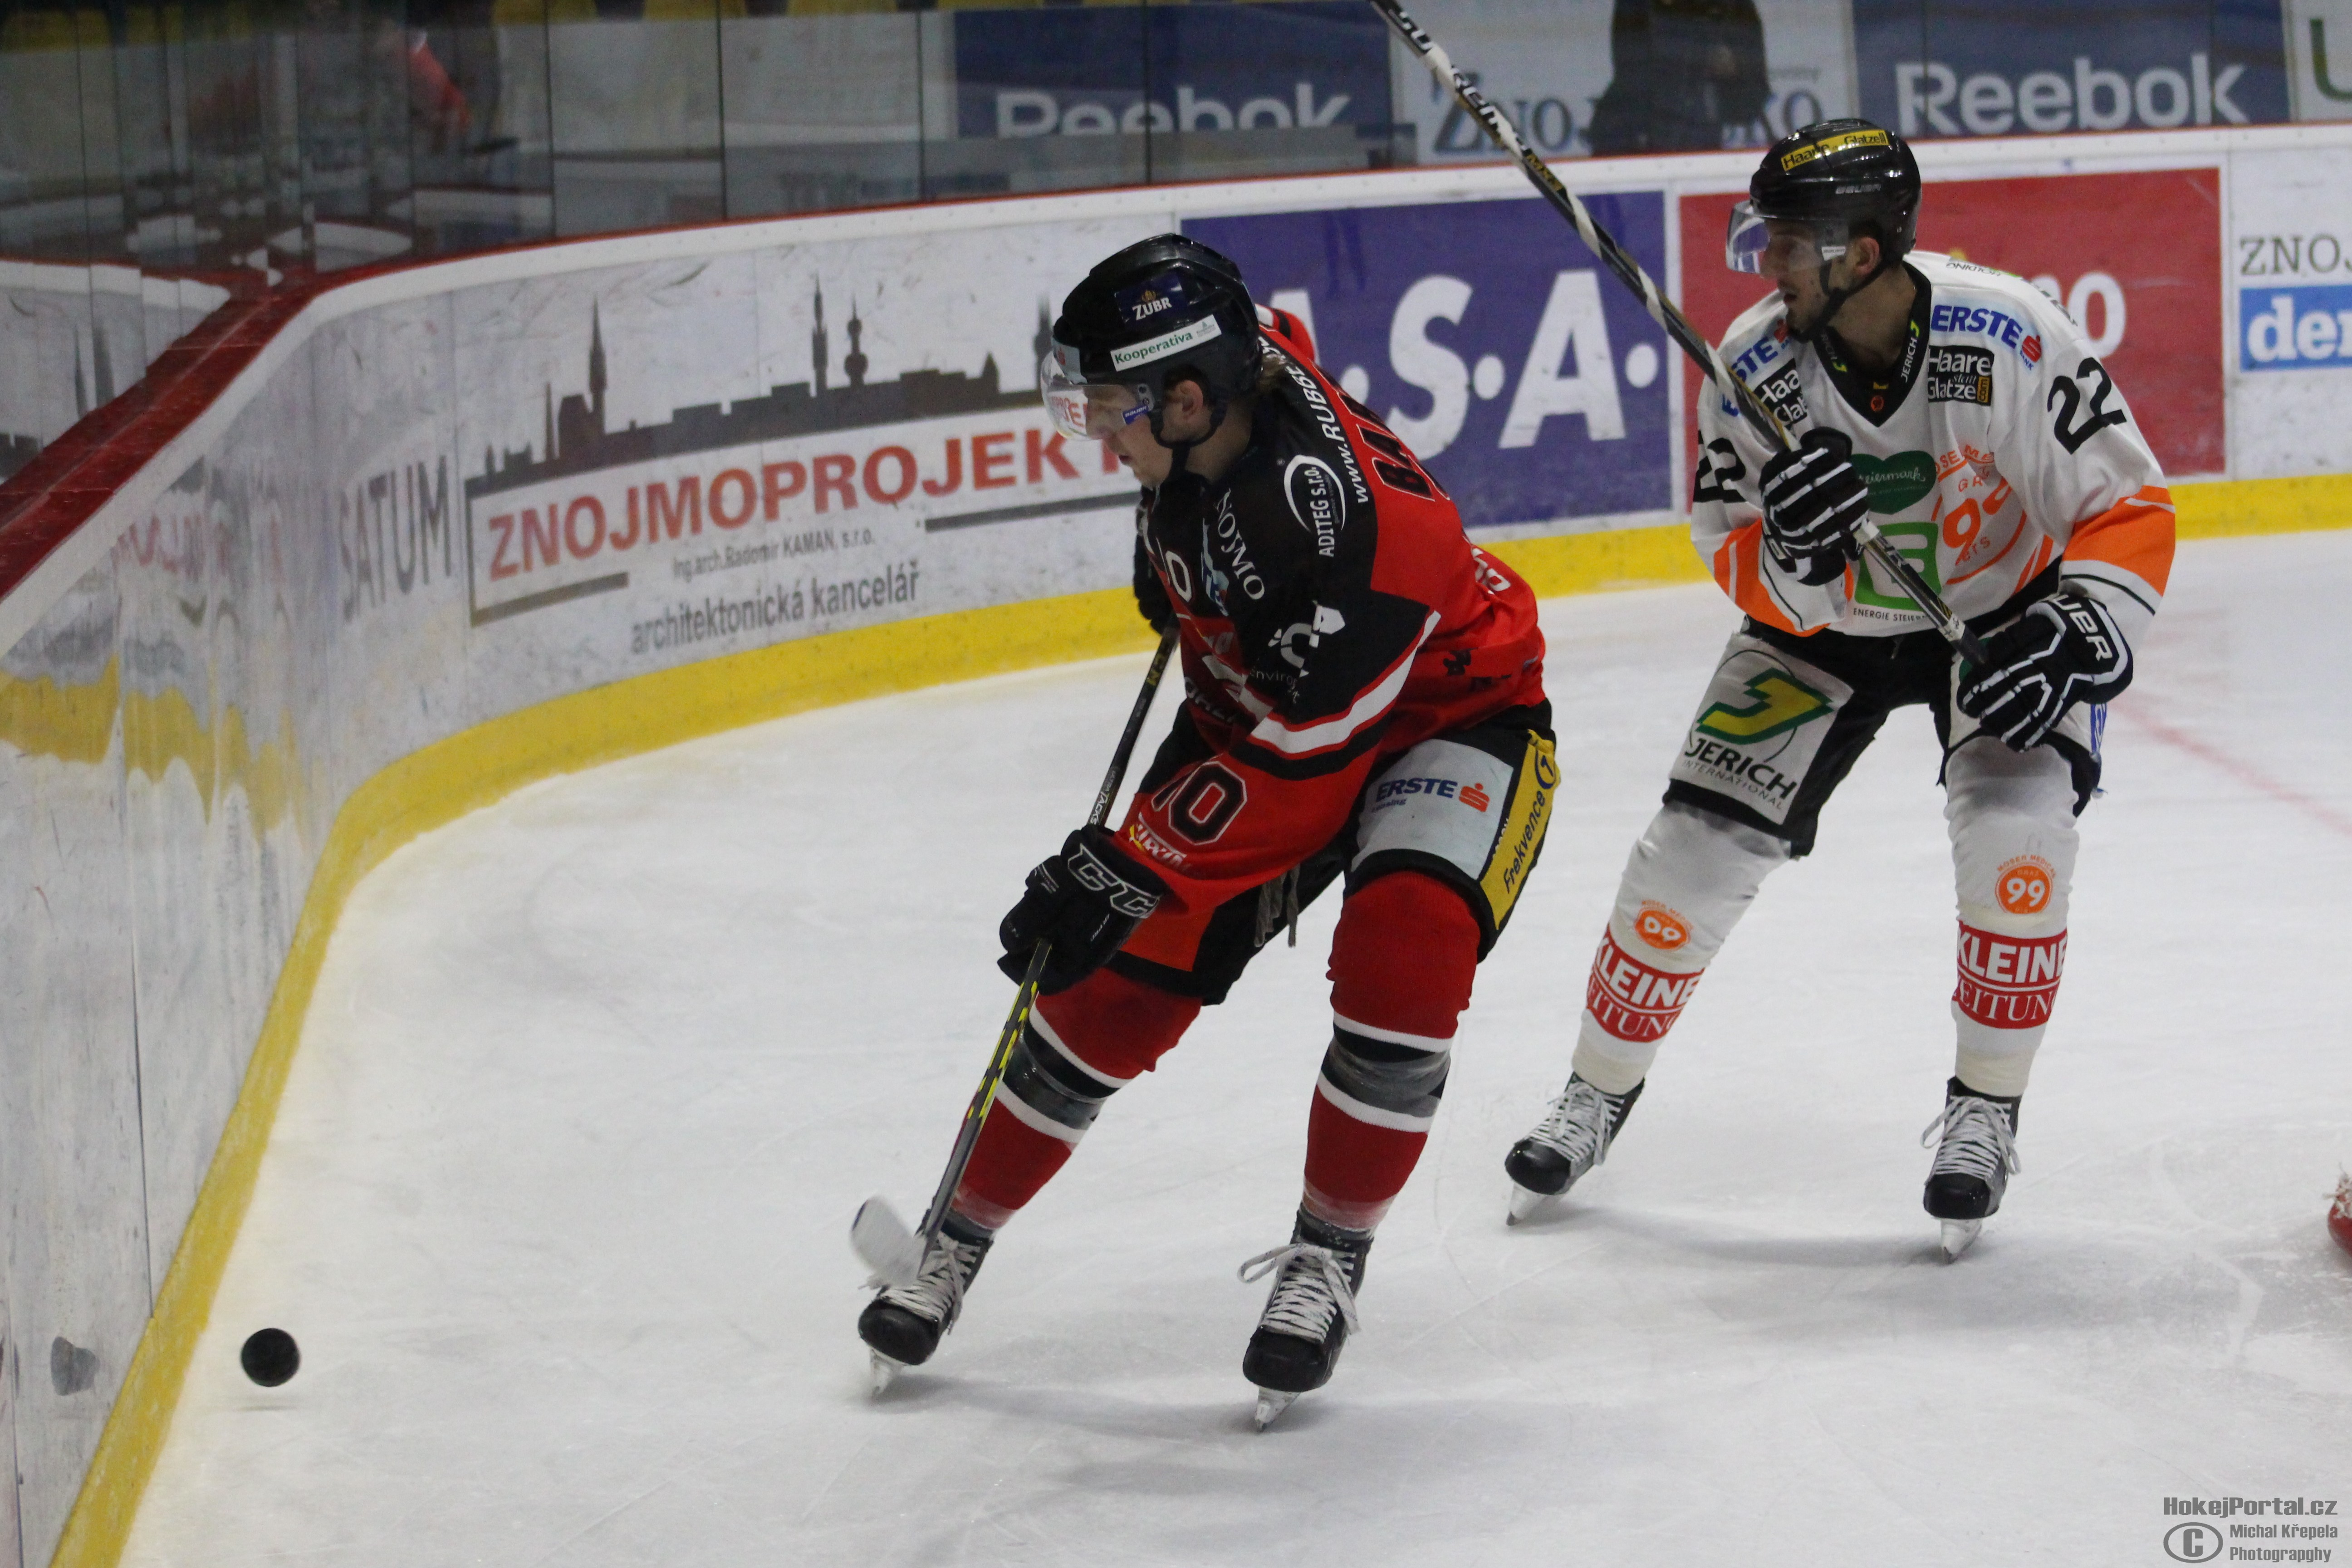 Hokejportal